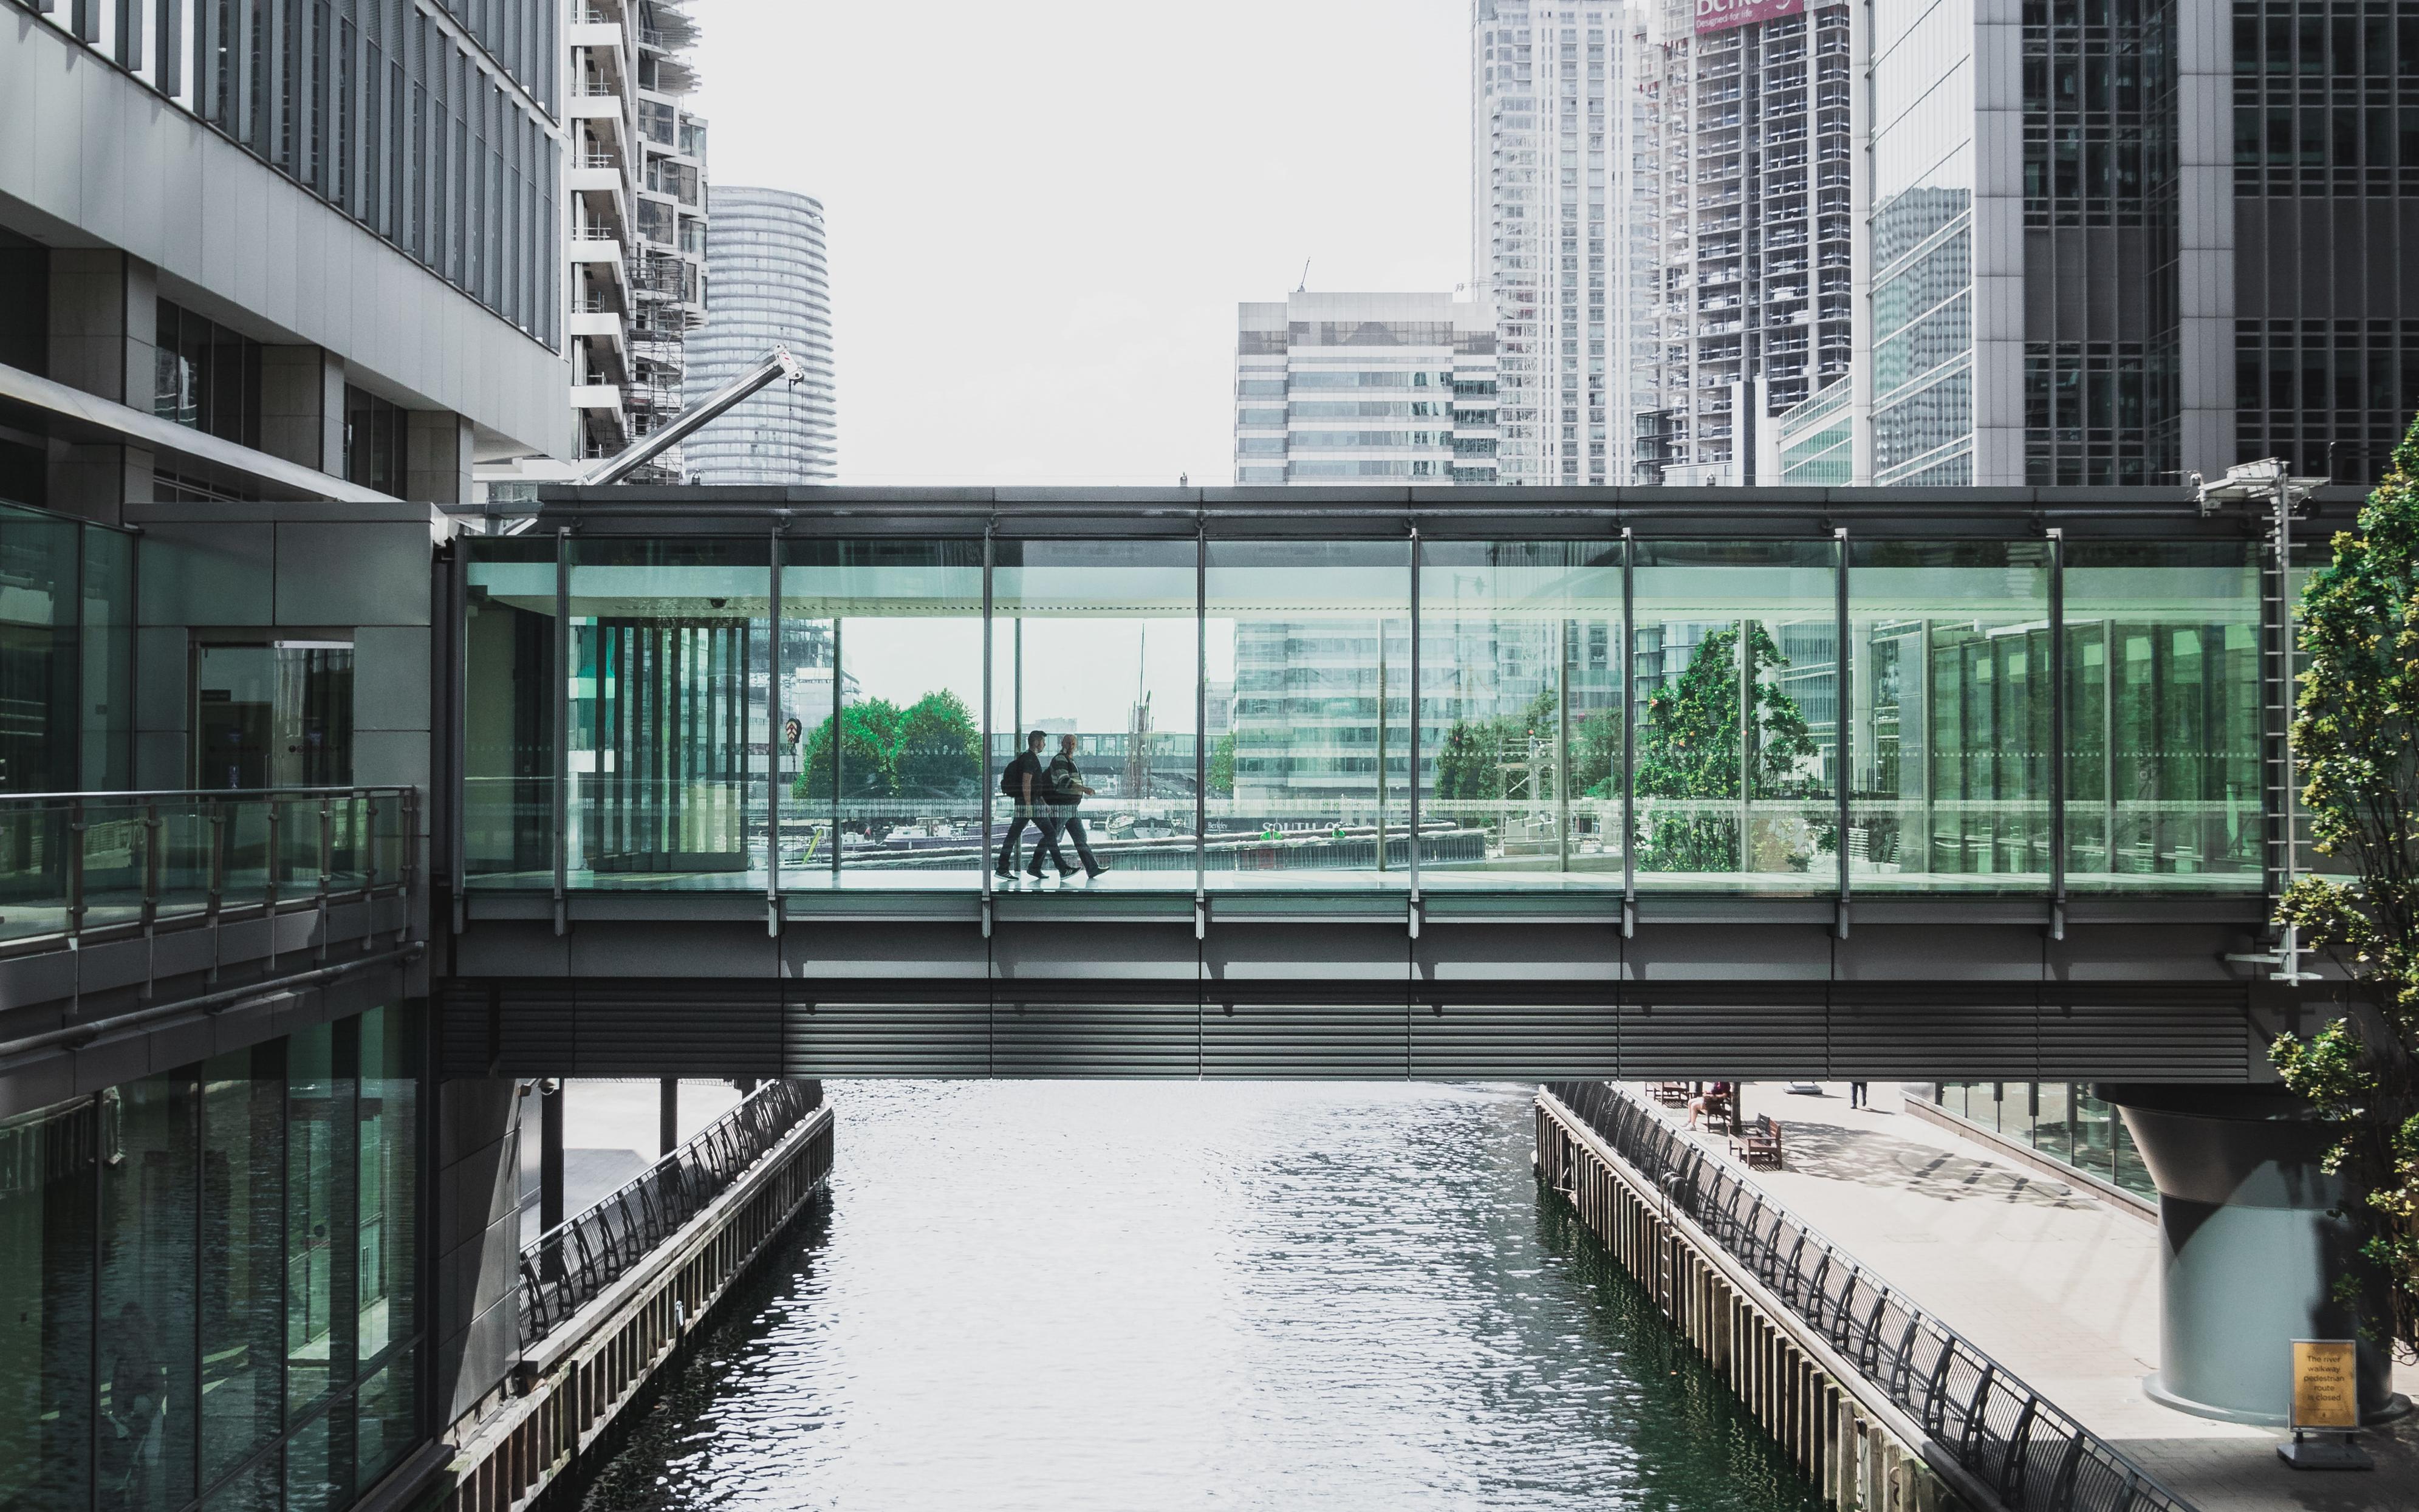 People walking across a skybridge in Canary Wharf